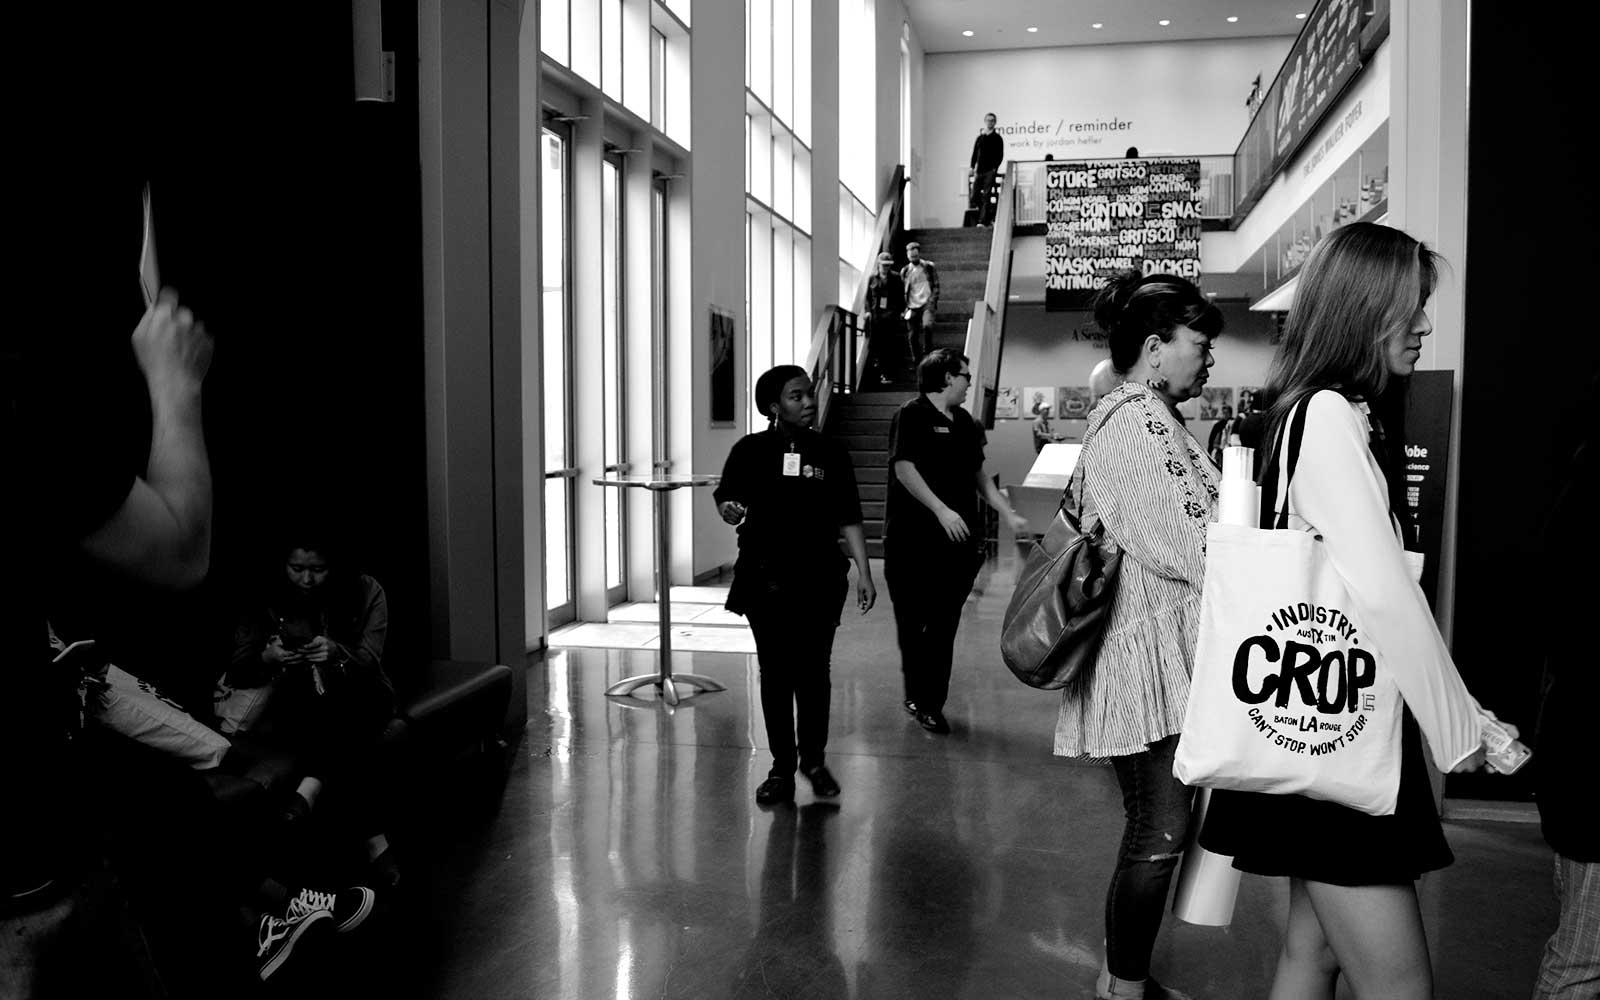 IOH Crop Con 2019 Baton Rouge